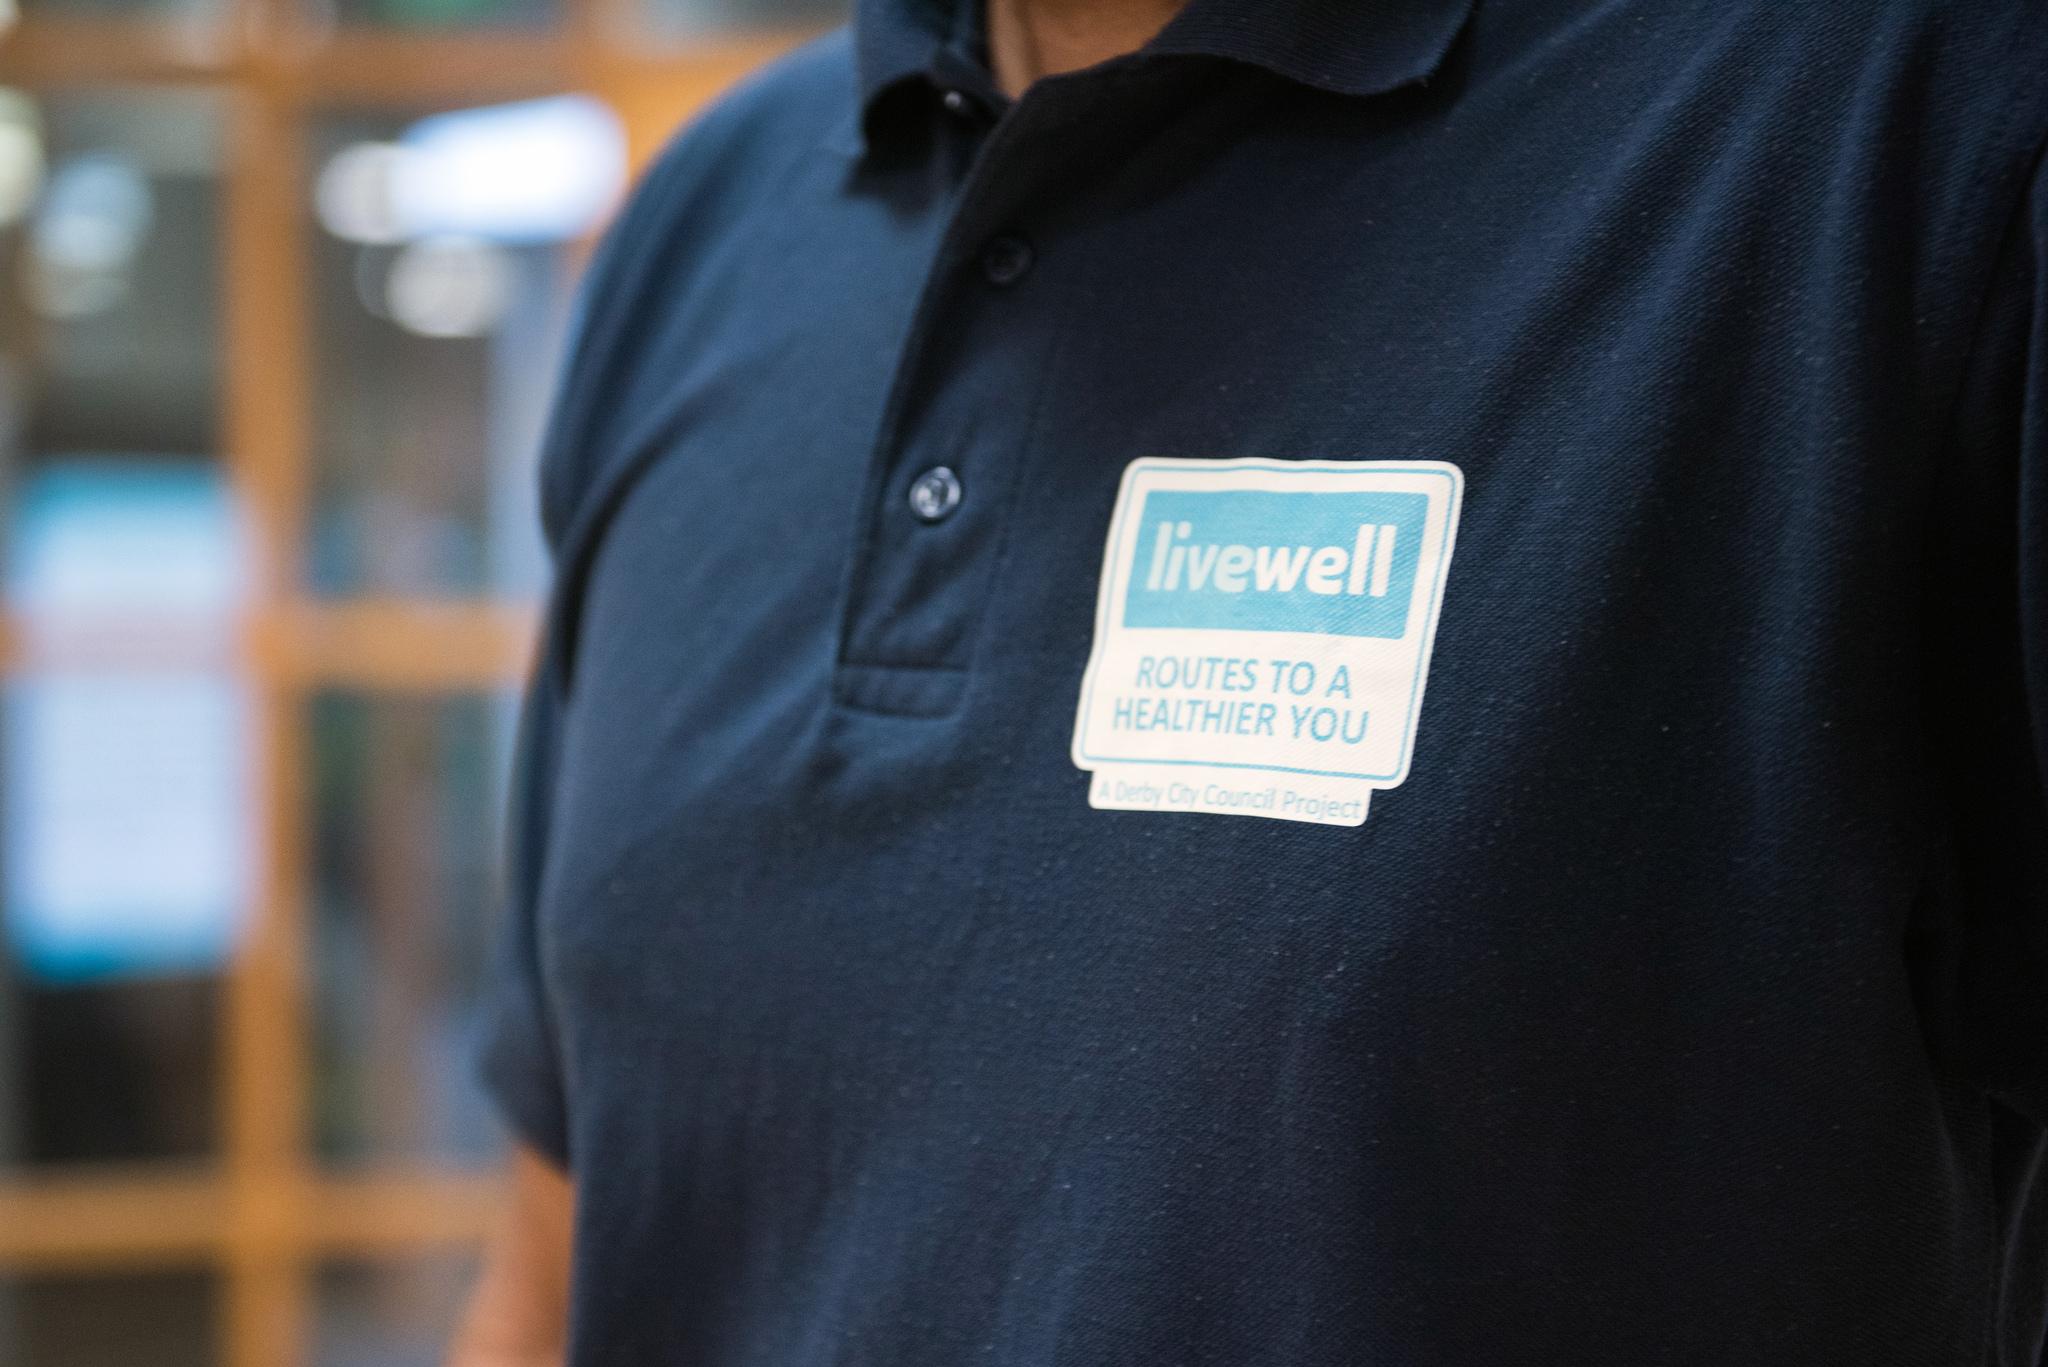 Image of Livewell logo on uniform